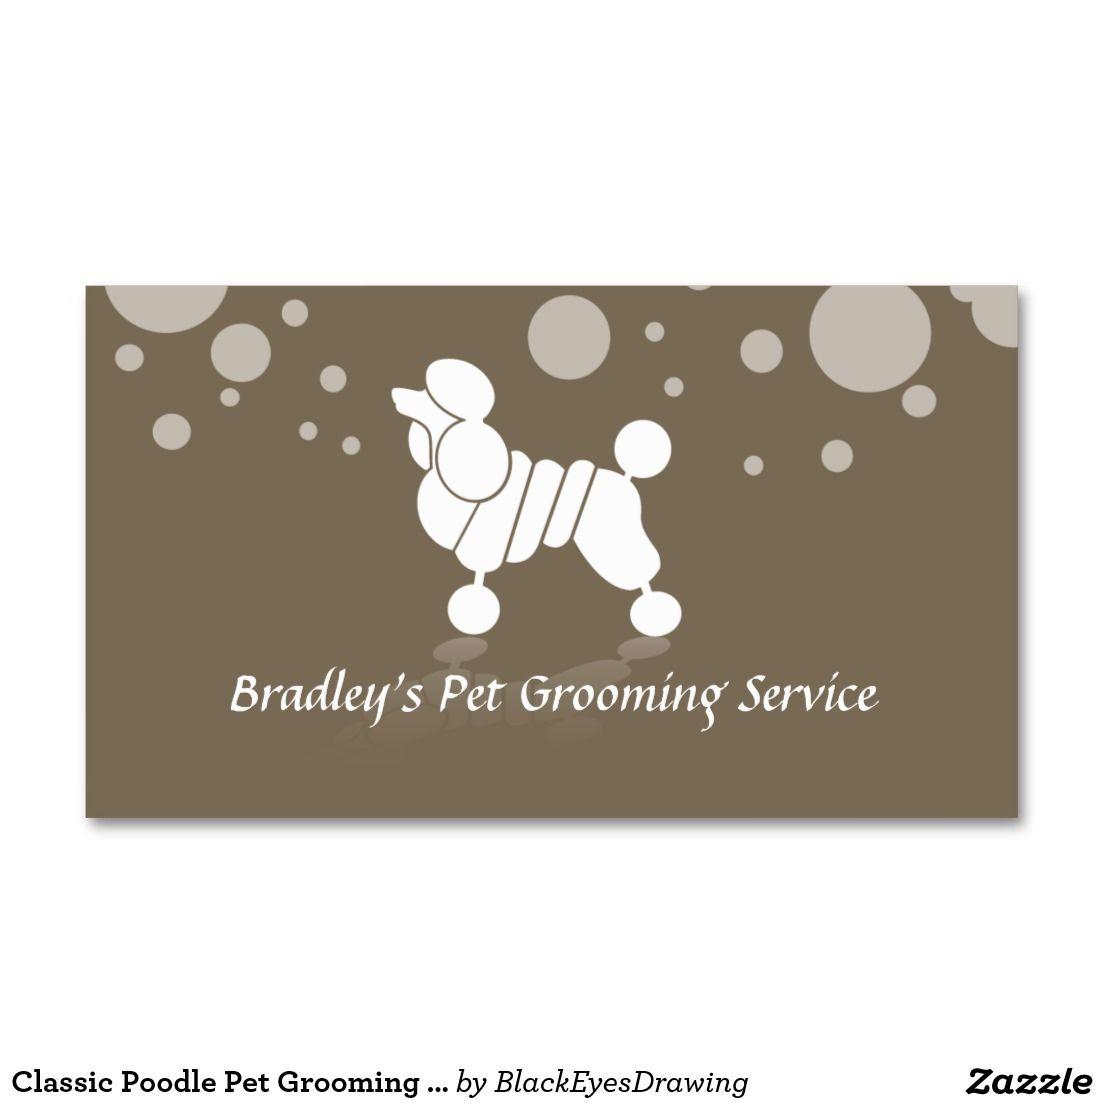 Classic Poodle Pet Grooming Service Business Card | Pinterest | Pet ...